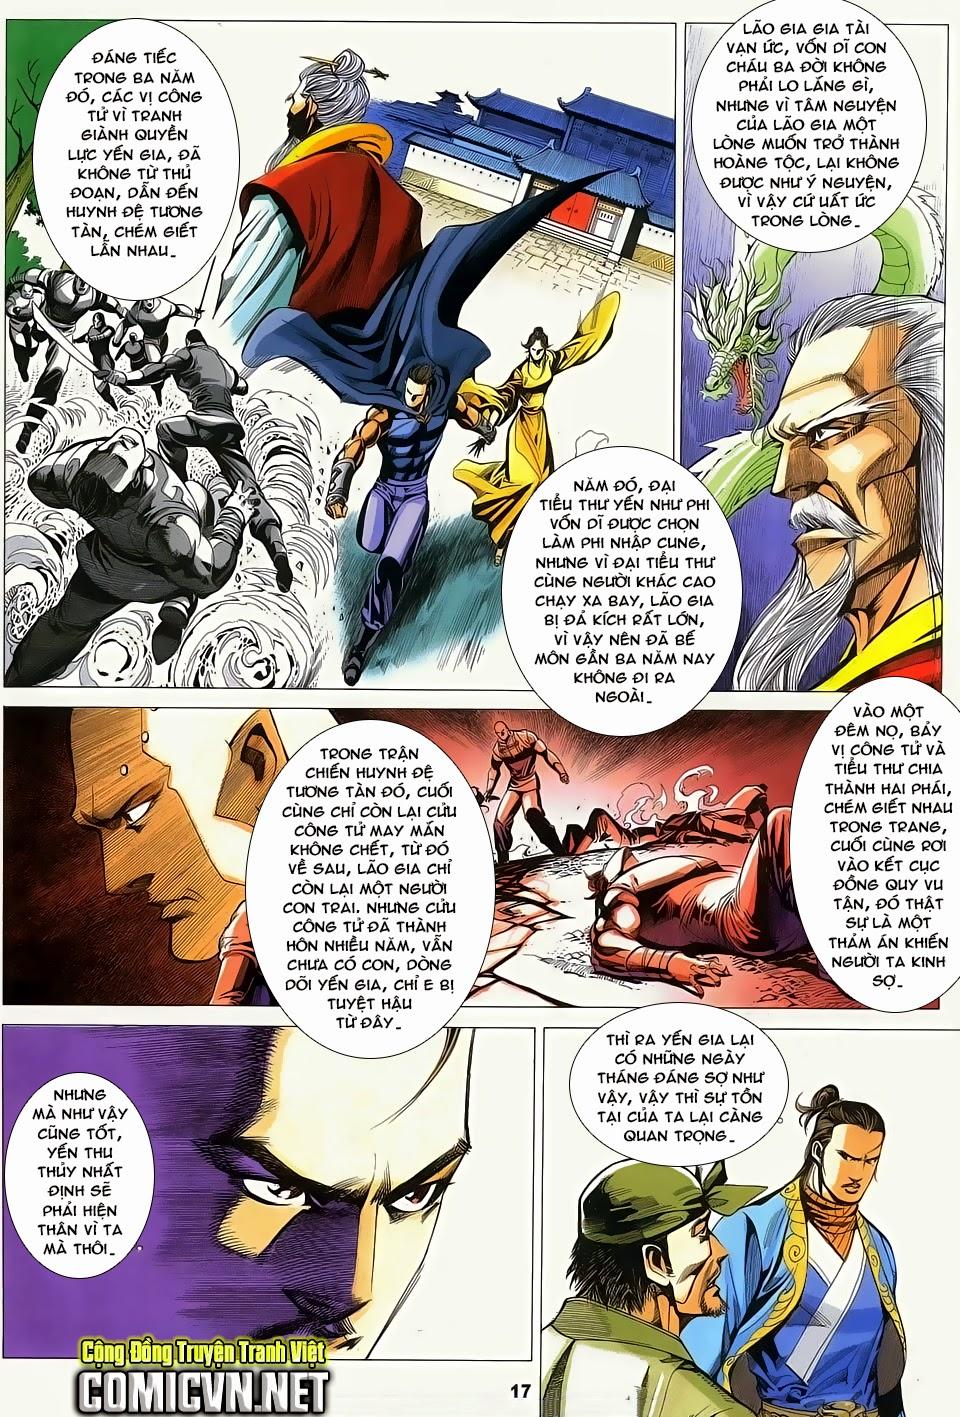 Cổ Long Quần Hiệp Truyện chap 84 Trang 17 - Mangak.info